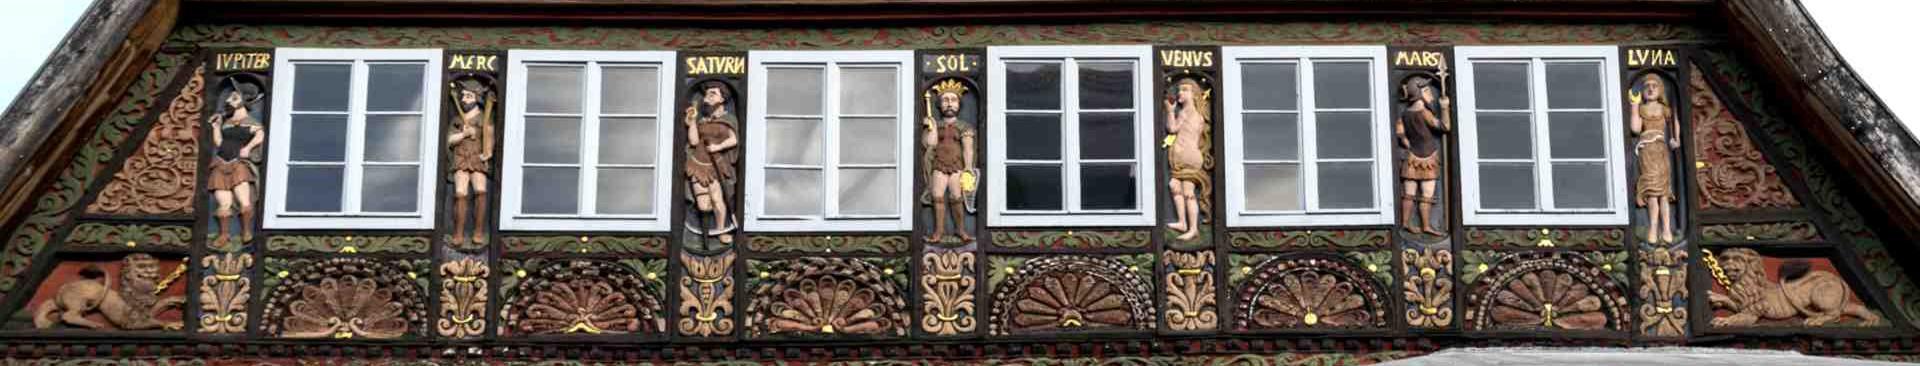 Alte Hansestadt Lemgo